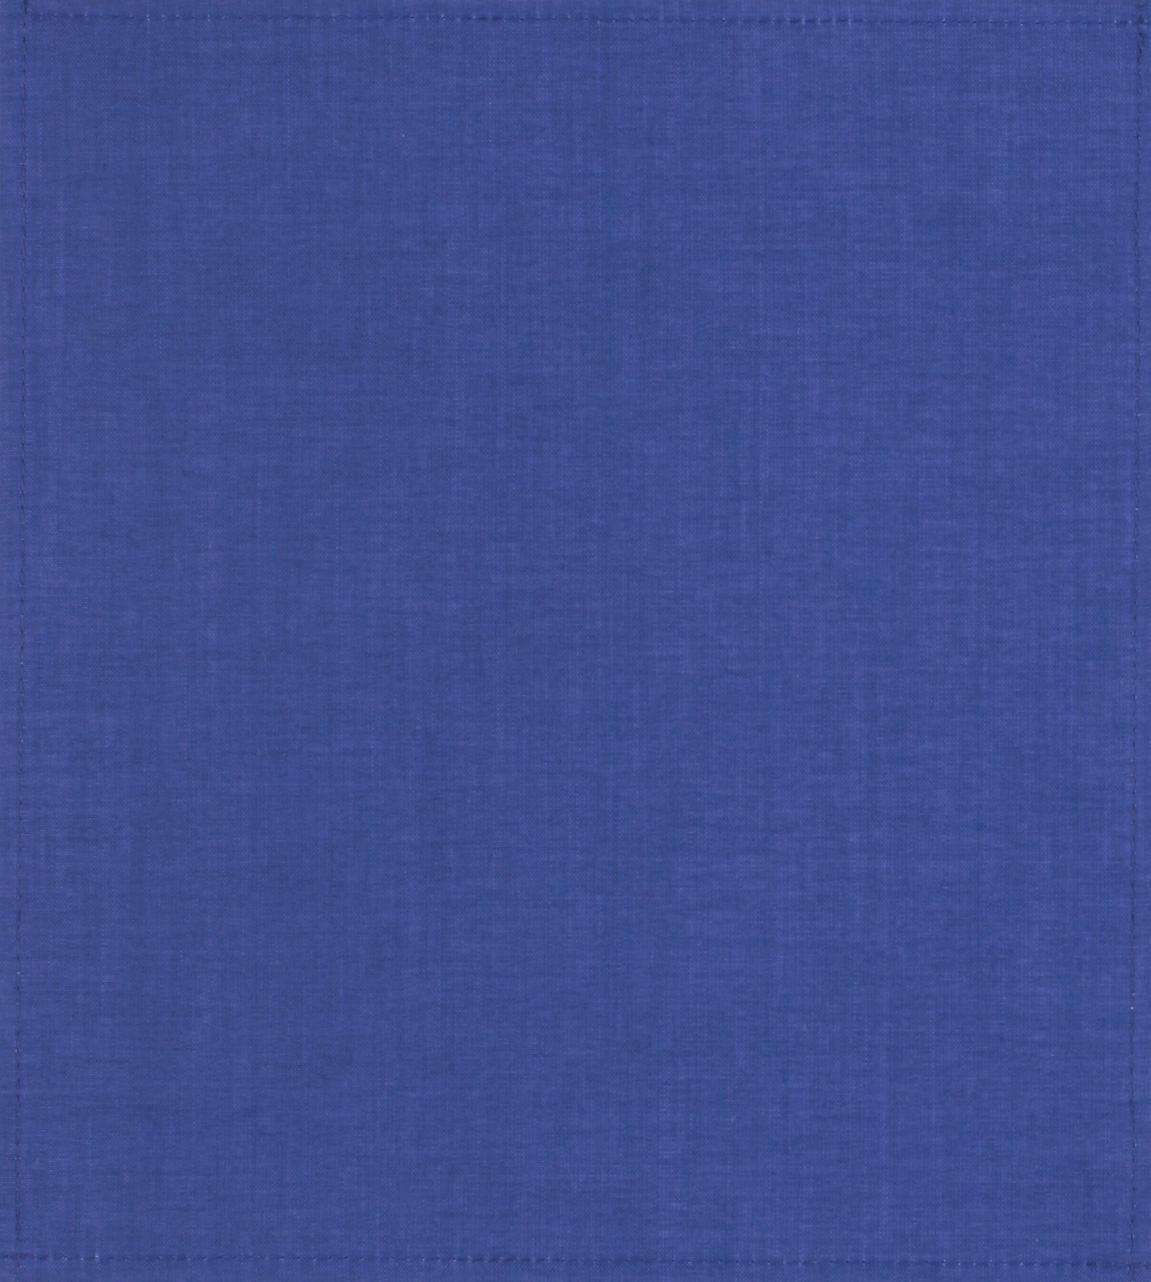 Cordura blau (mittel)